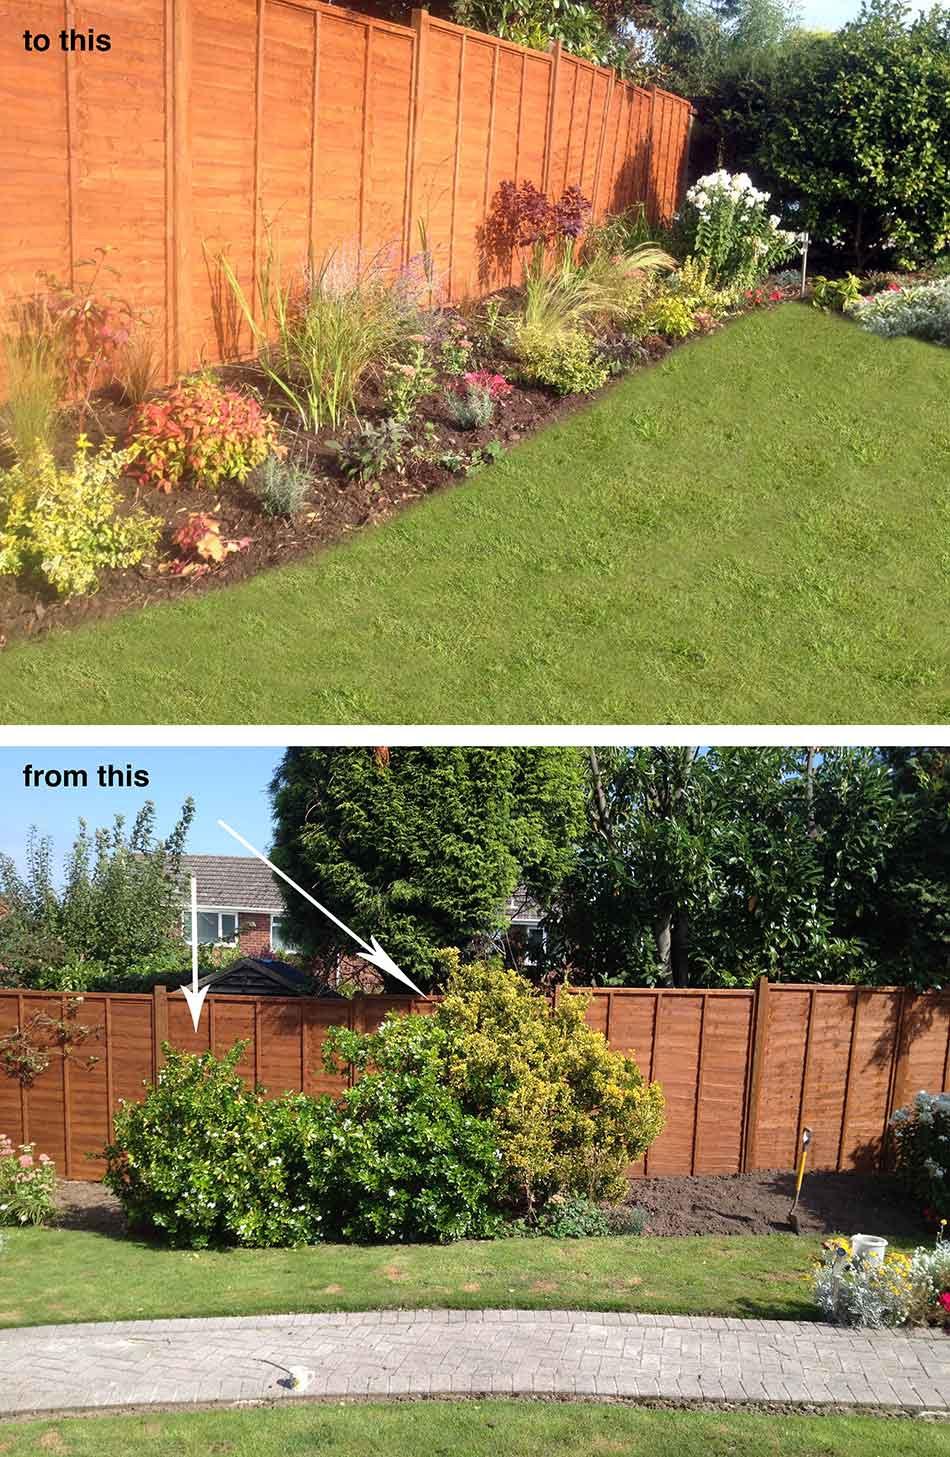 Garden Ideas And Design Blog Hornby Garden Designs Full Service Garden Design Consultancy Garden Designers In Shropshire Shrewsbury Uk